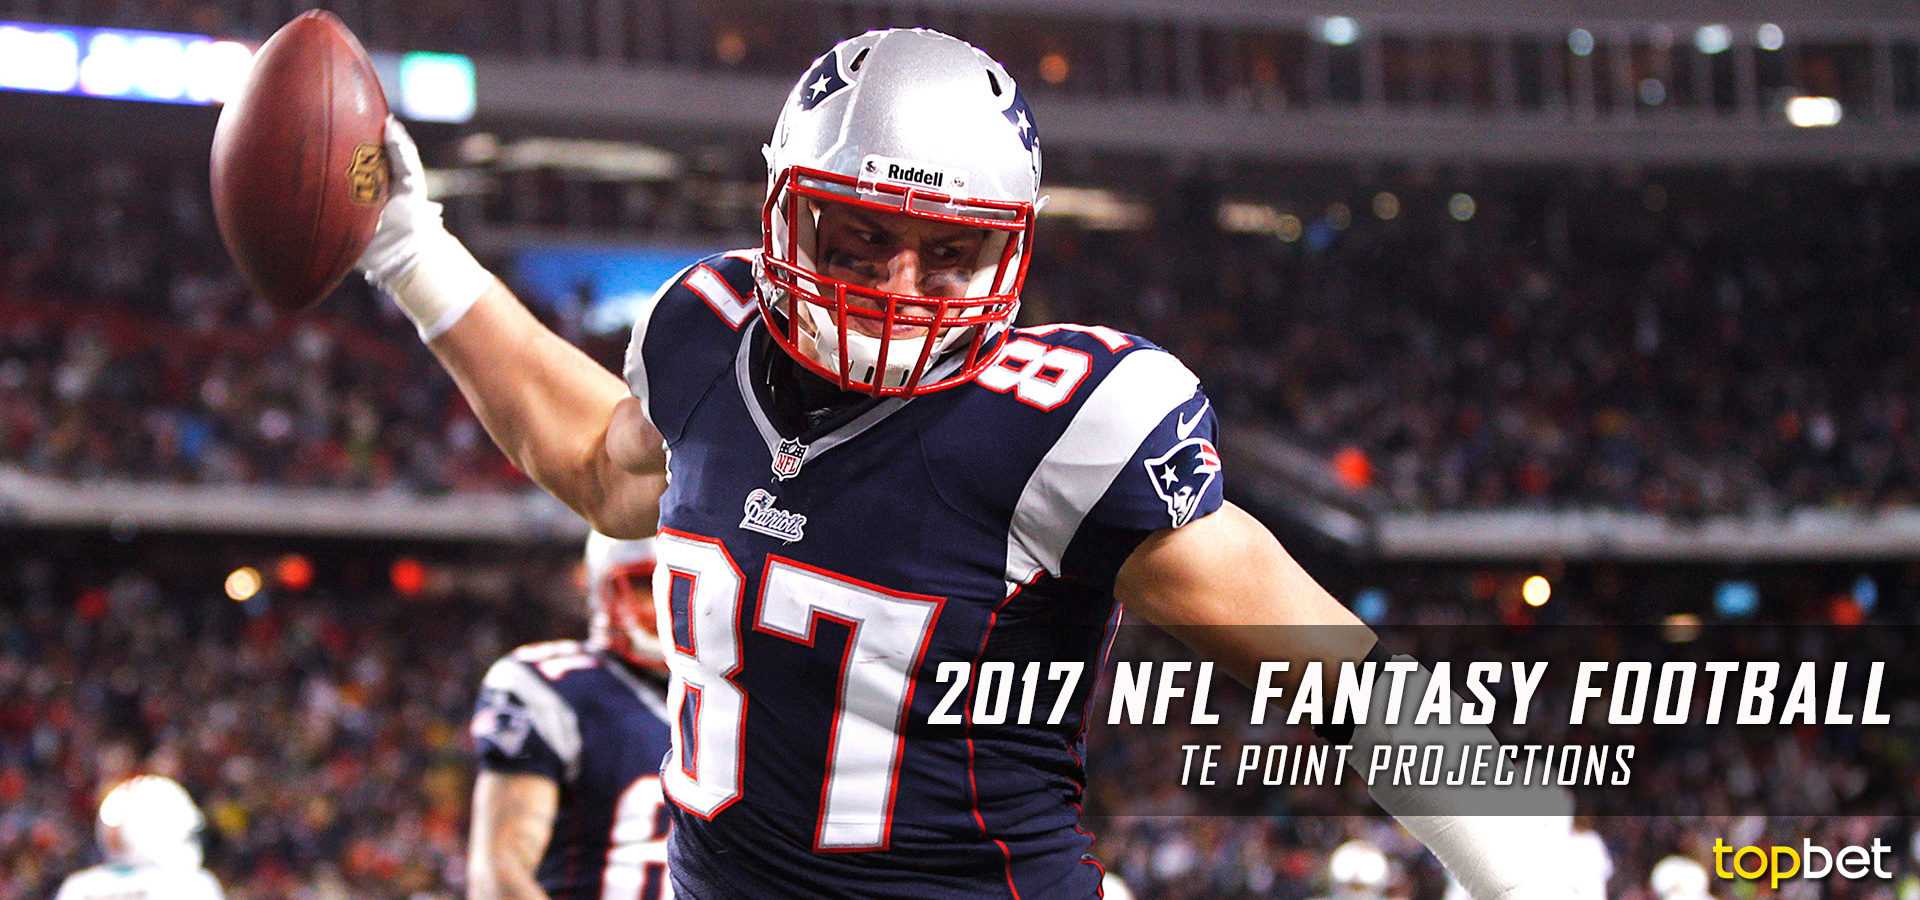 Fantasy Football TE Point Projections - 2017-18 NFL Season